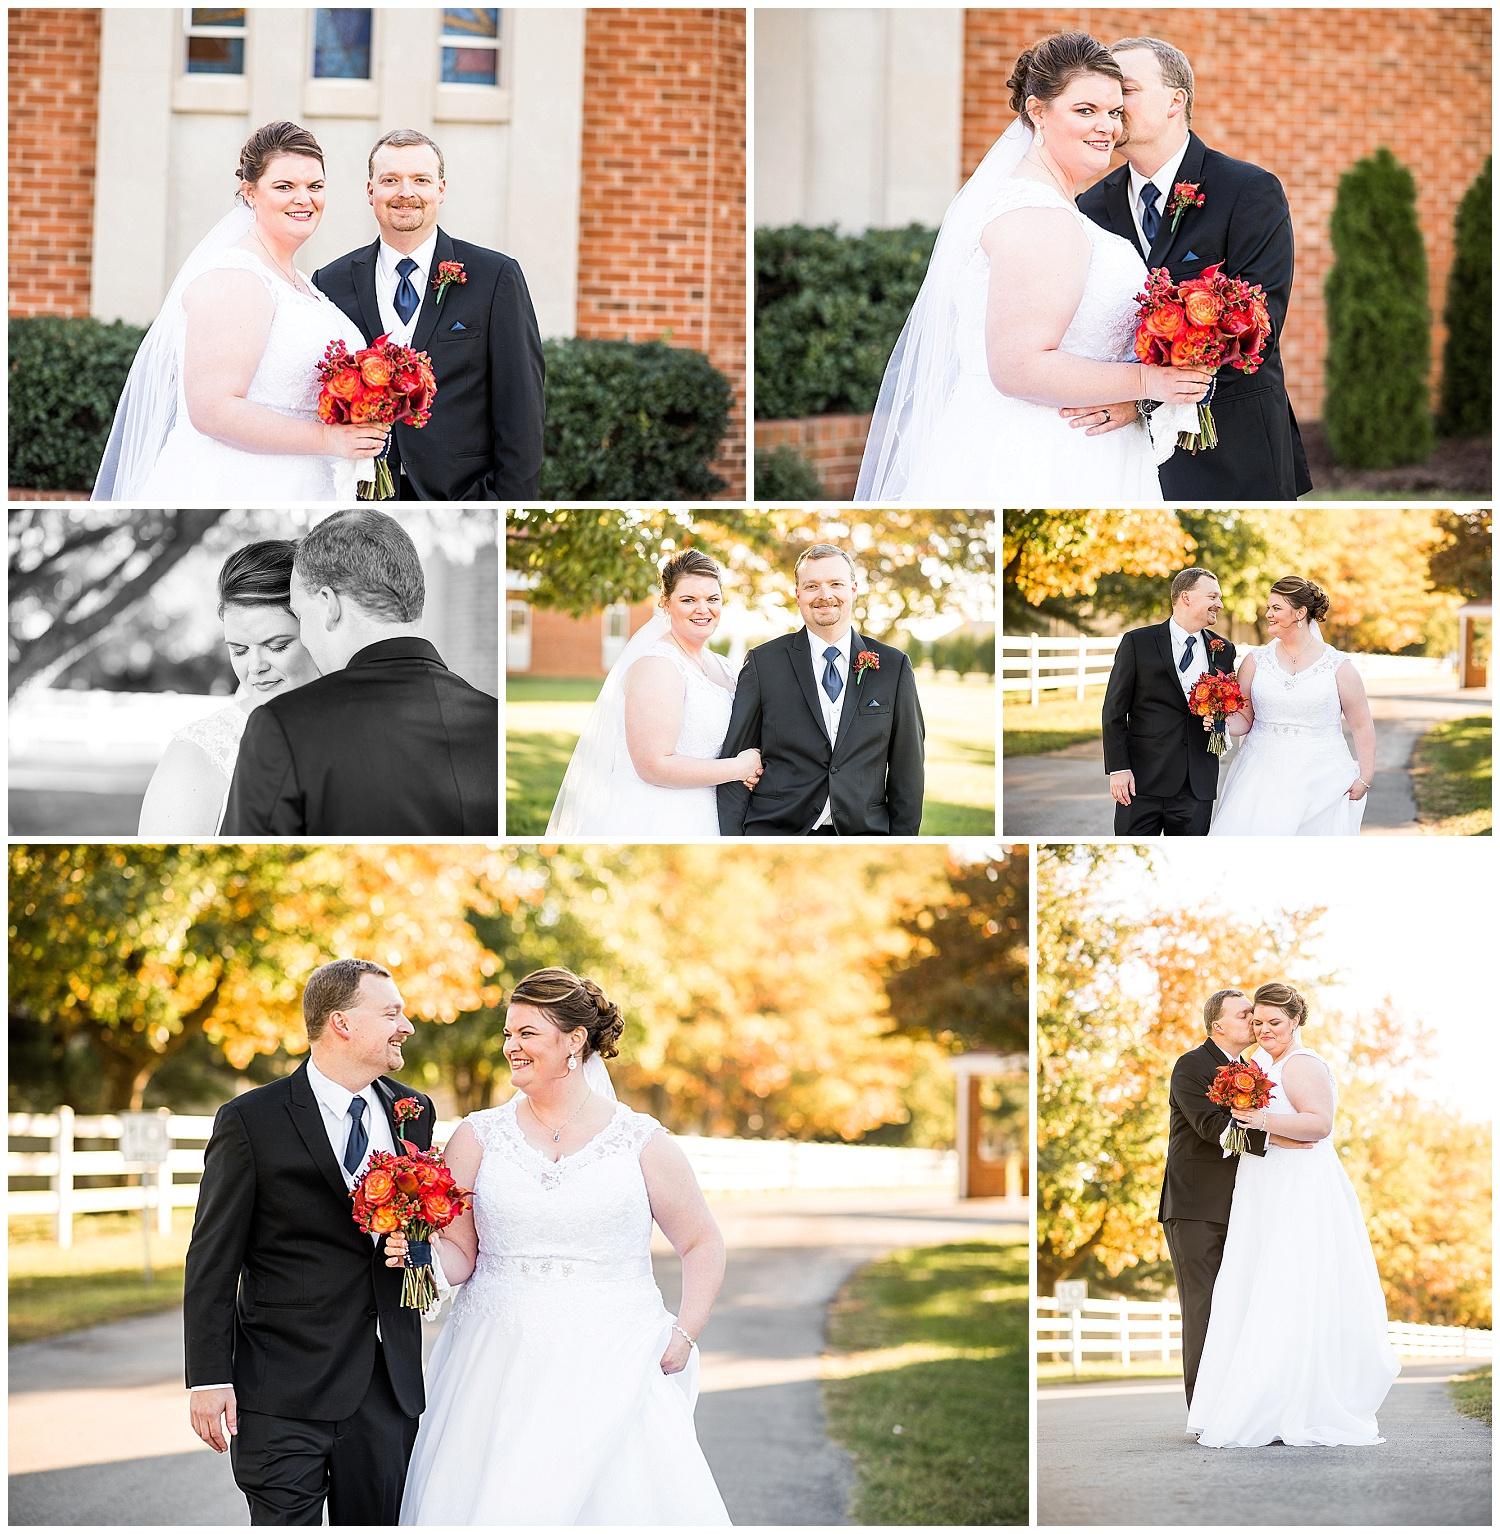 tiffany_daniel_wedding-3585.jpg